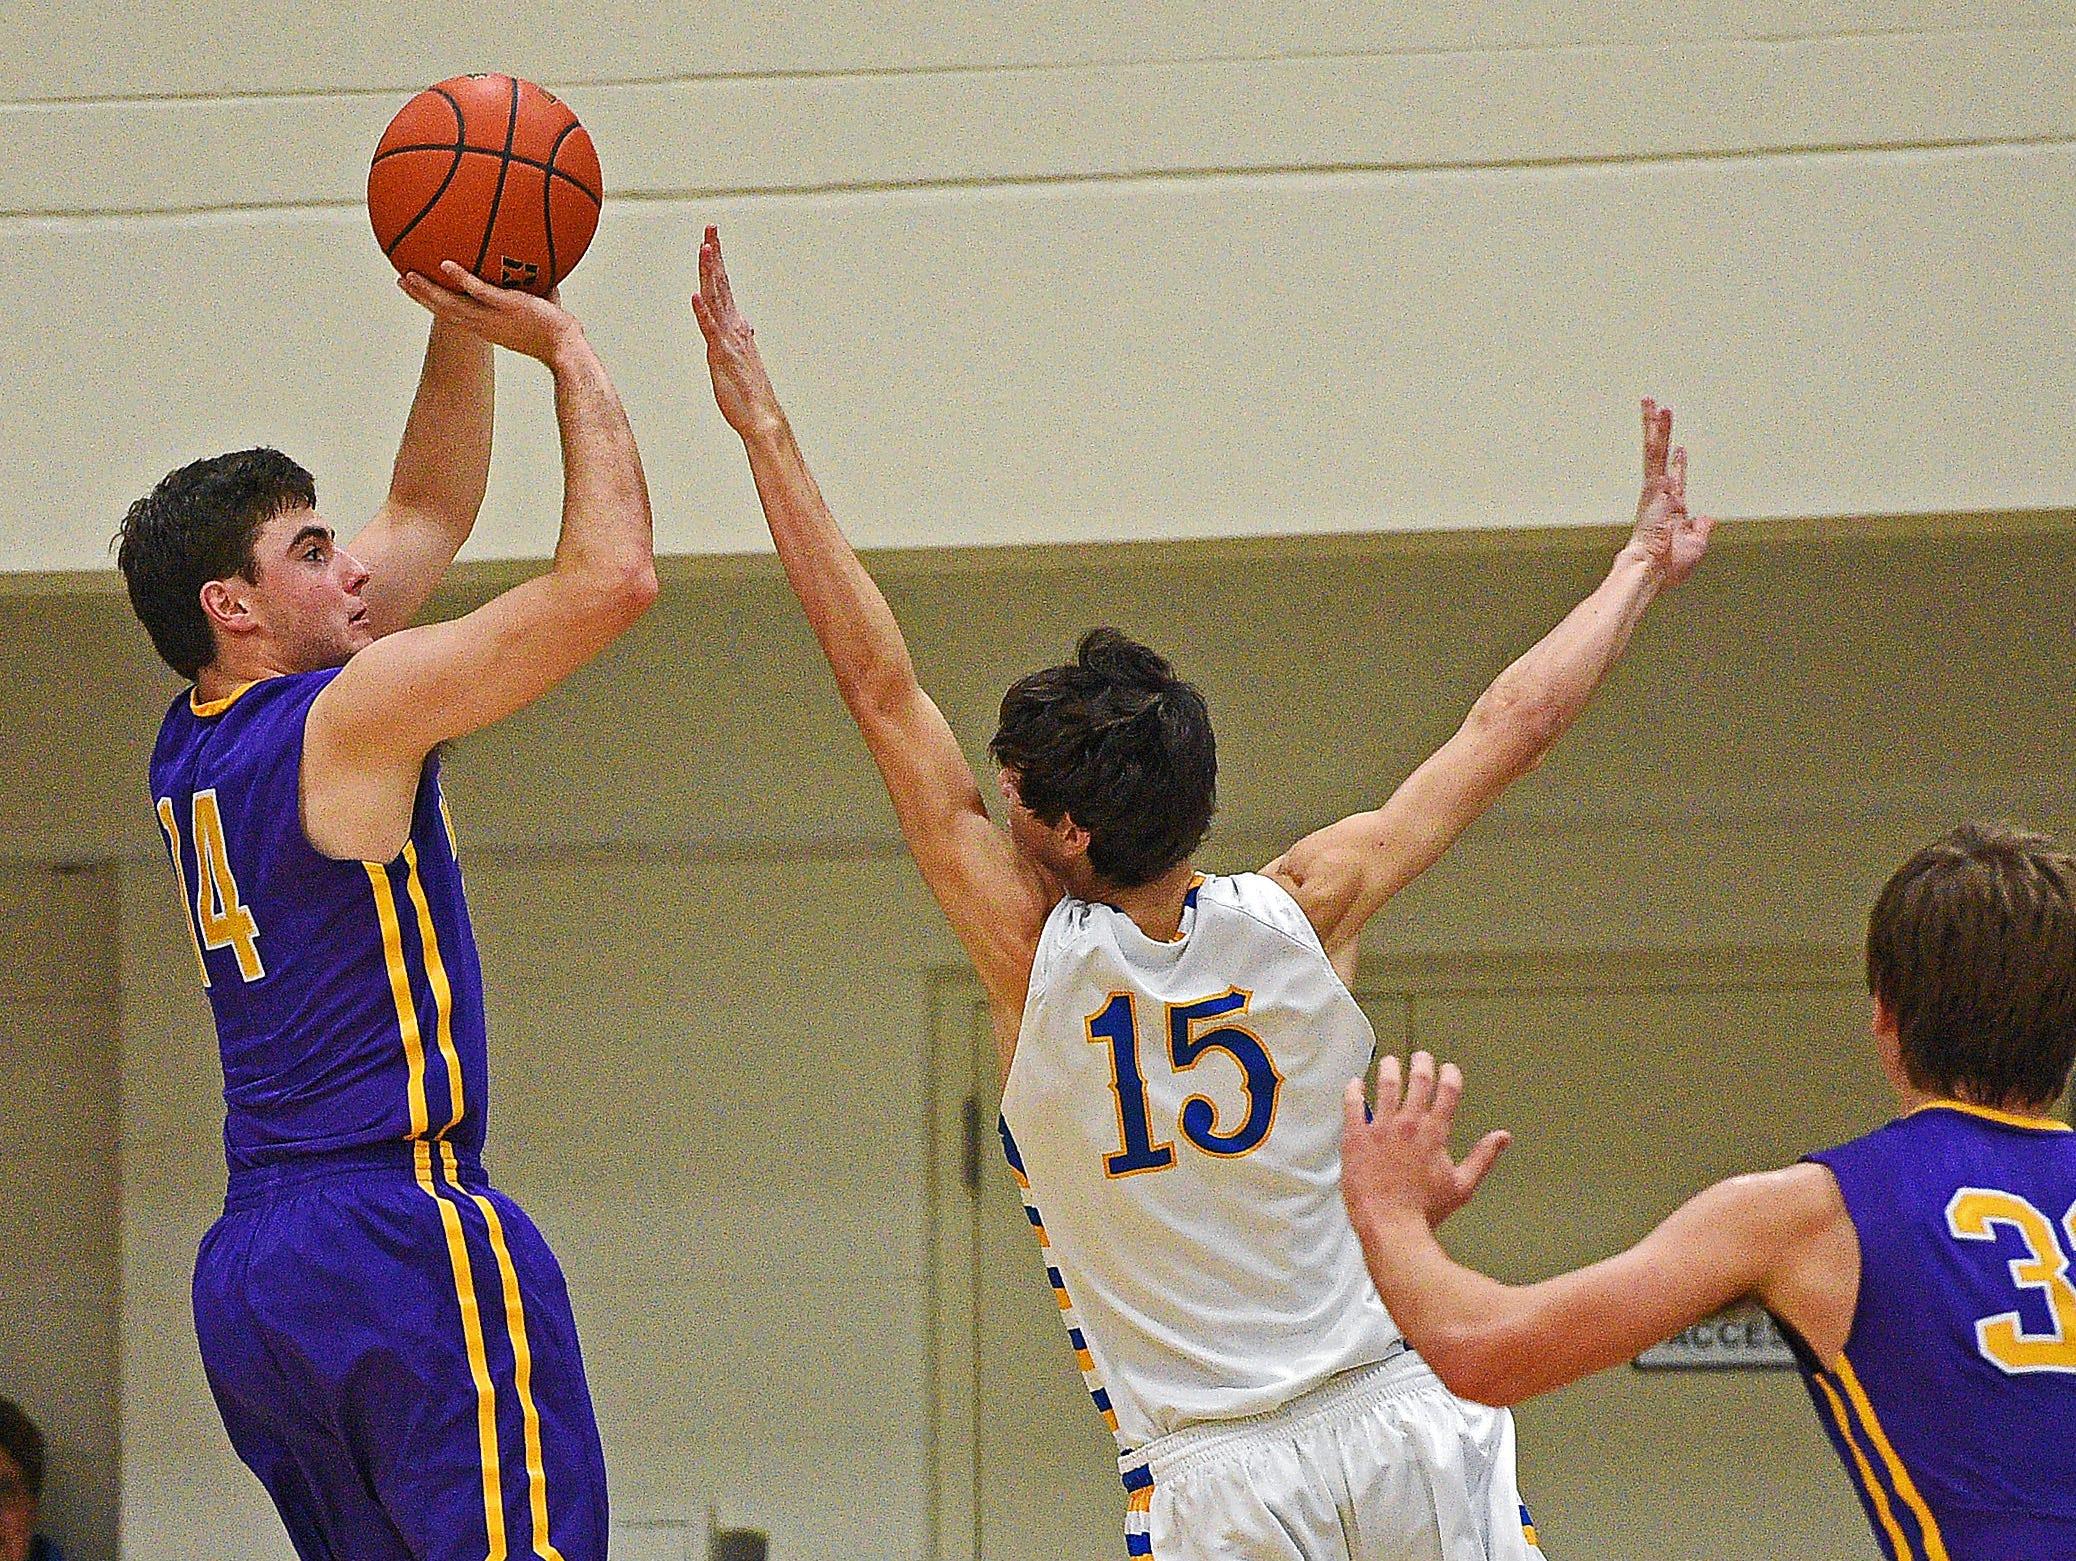 Watertown's Alex Gauer (14) takes a shot over O'Gorman's Joey Messler (15) during a game Thursday, Dec. 15, 2016, at O'Gorman High School in Sioux Falls.